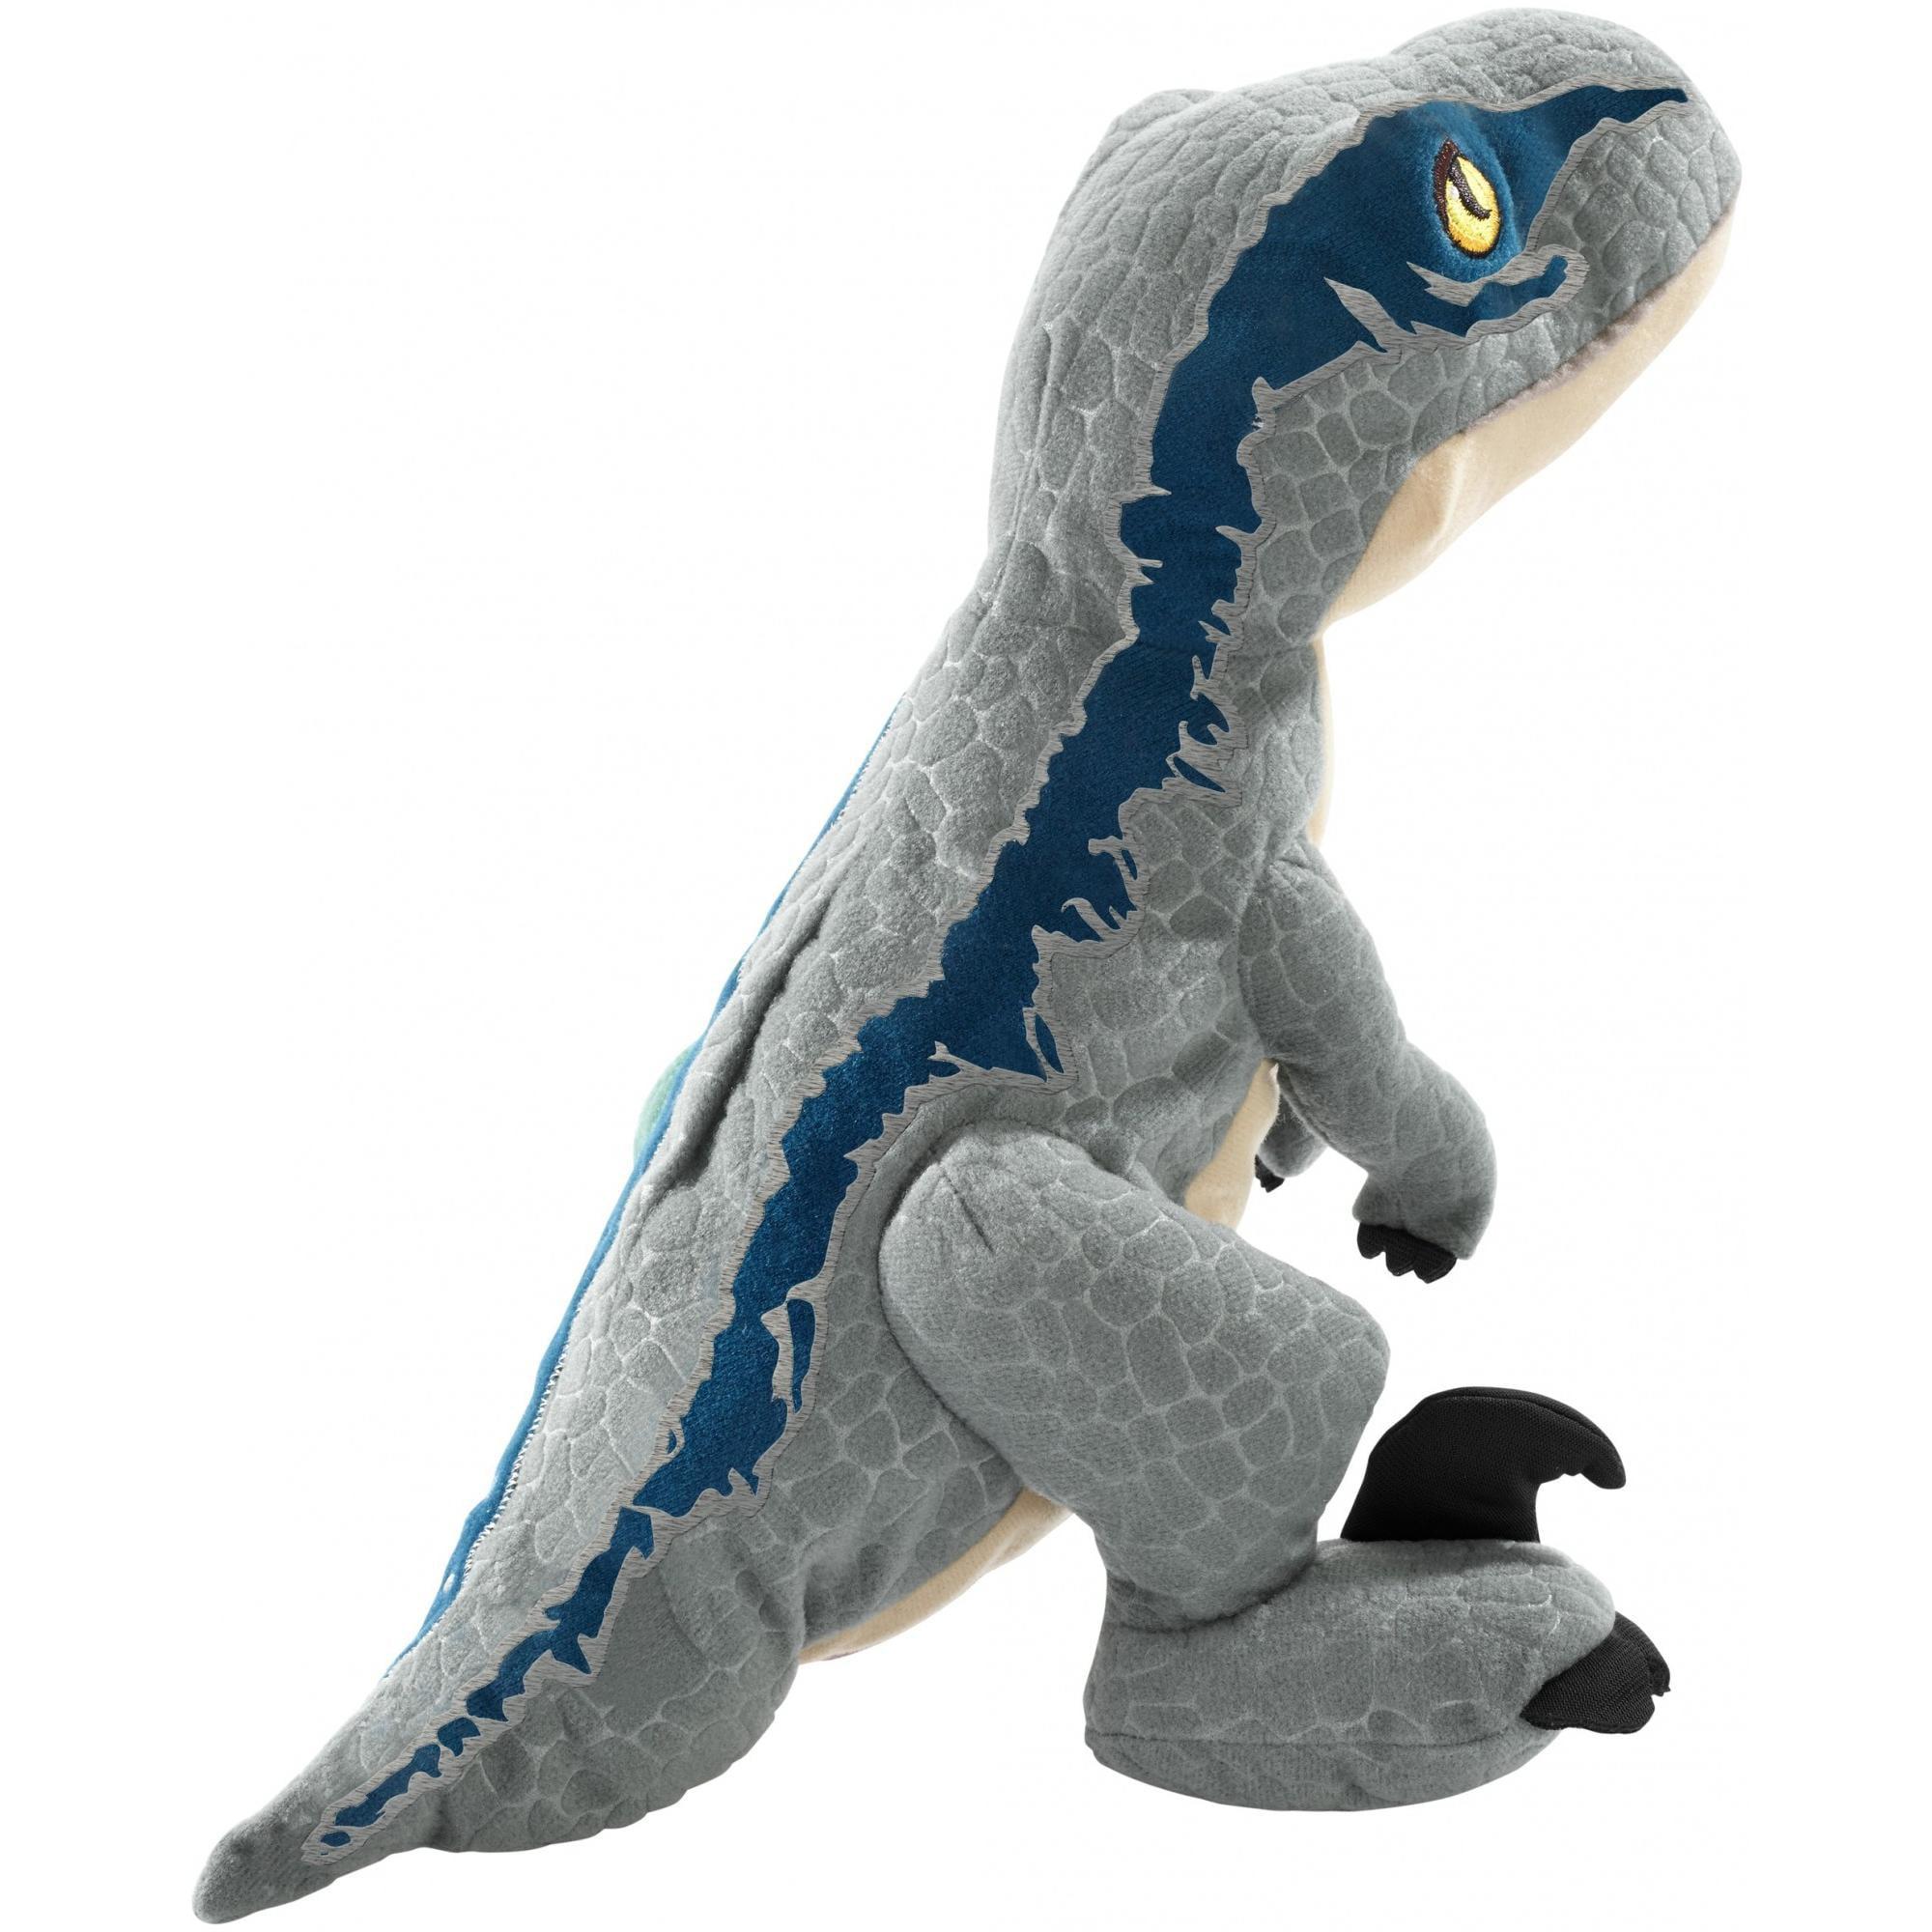 5ee80e50ca1 Jurassic World Dinosaurprise Velociraptor Blue Plush - Walmart.com